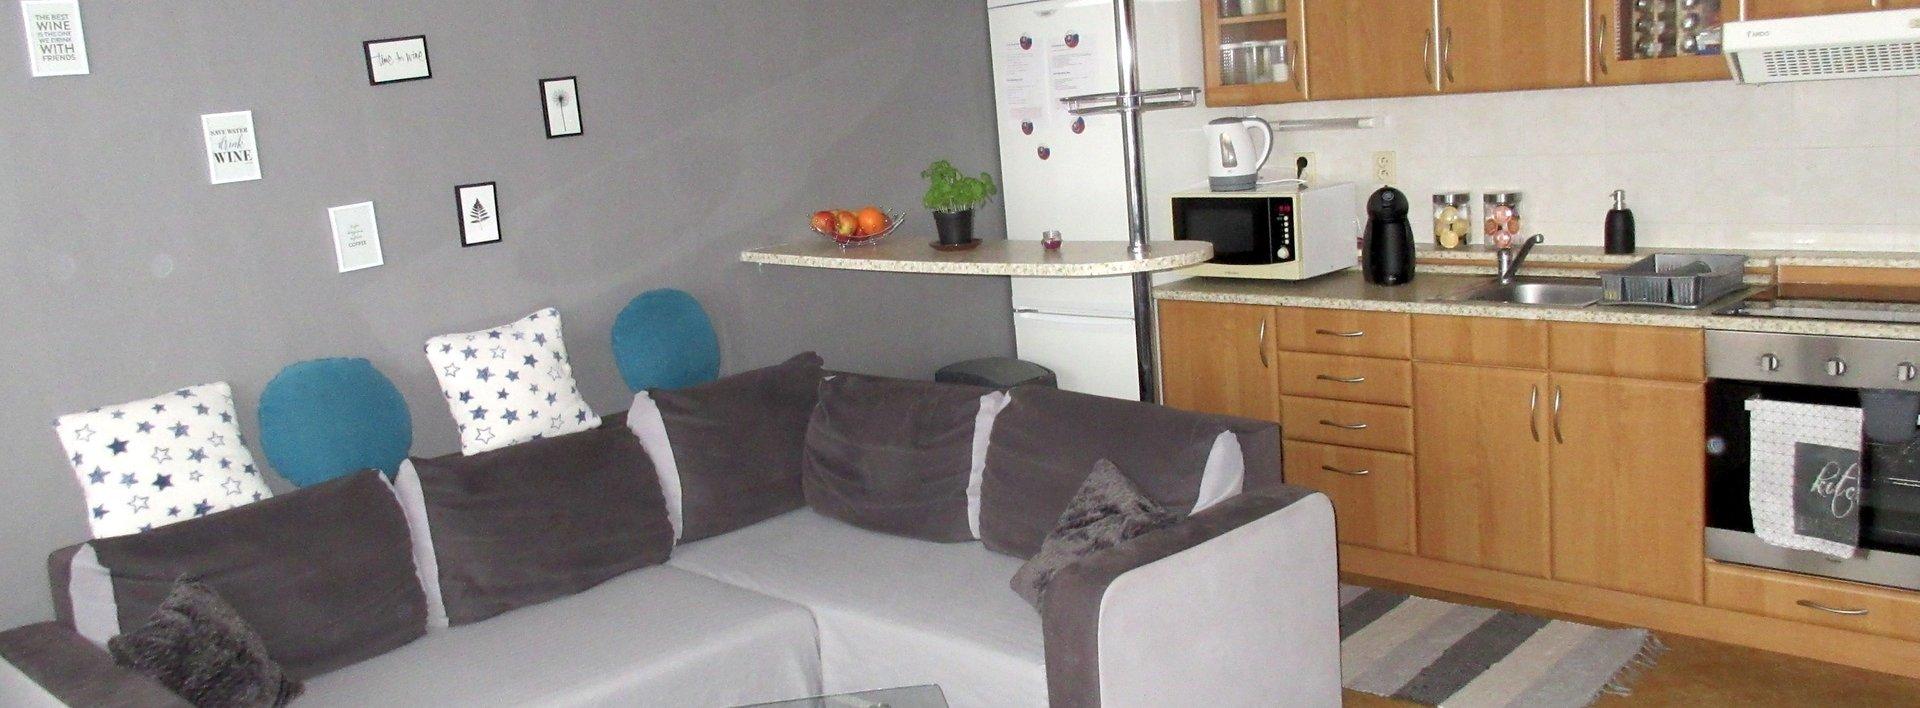 Prodej slunného bytu 2+kk s lodžií, 58 m² - Liberec, ul. Seniorů, Ev.č.: N48352